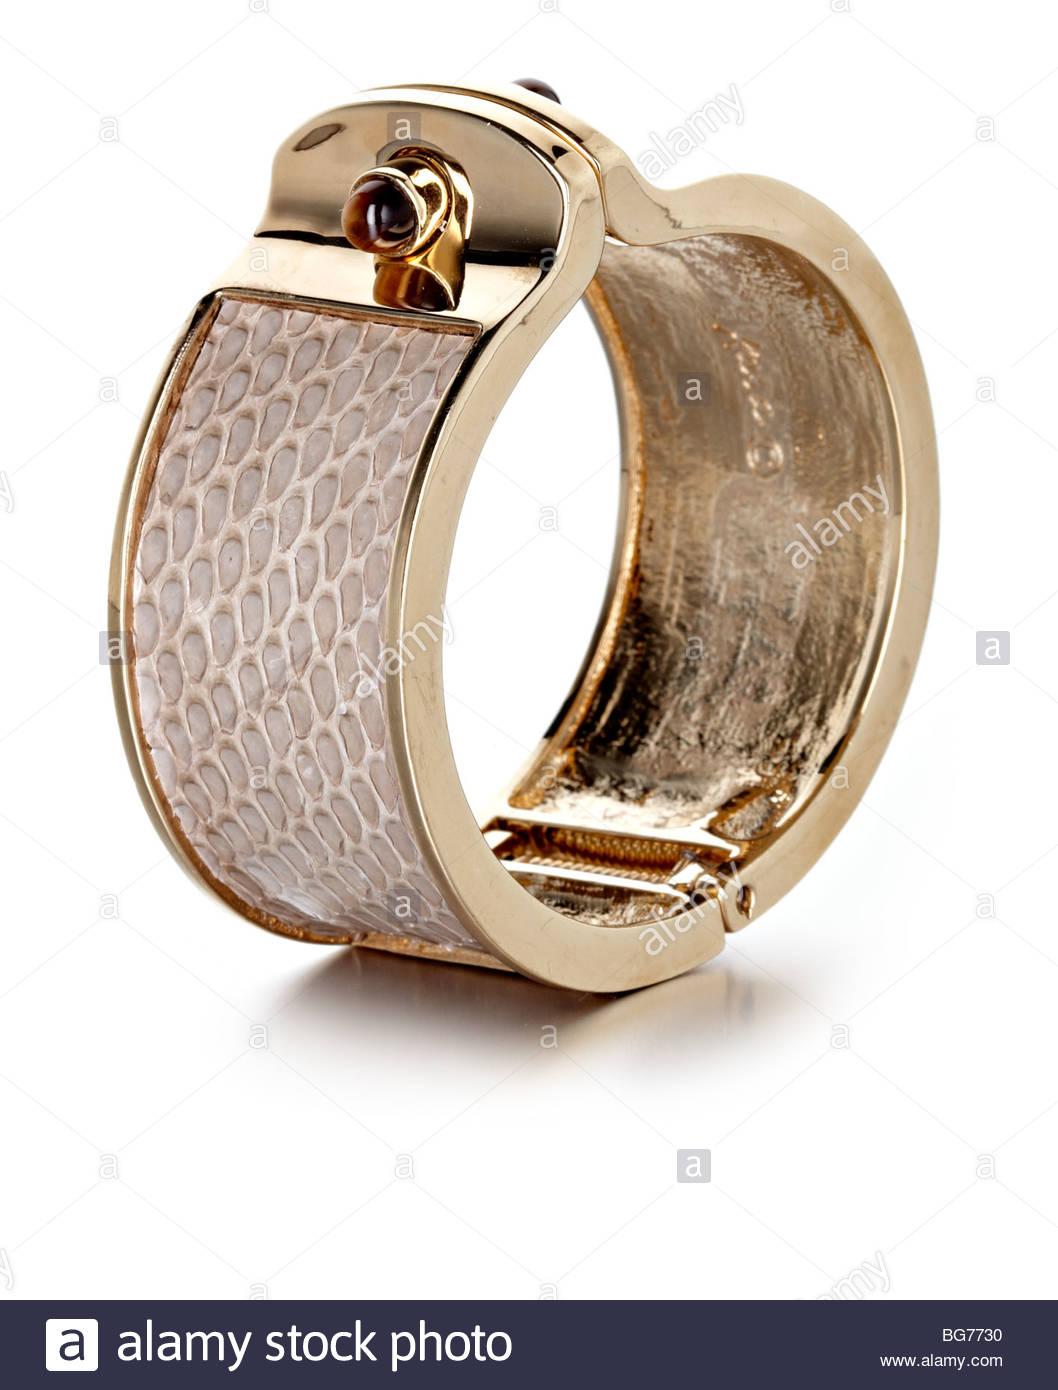 gold look metal and snake skin bangle - Stock Image